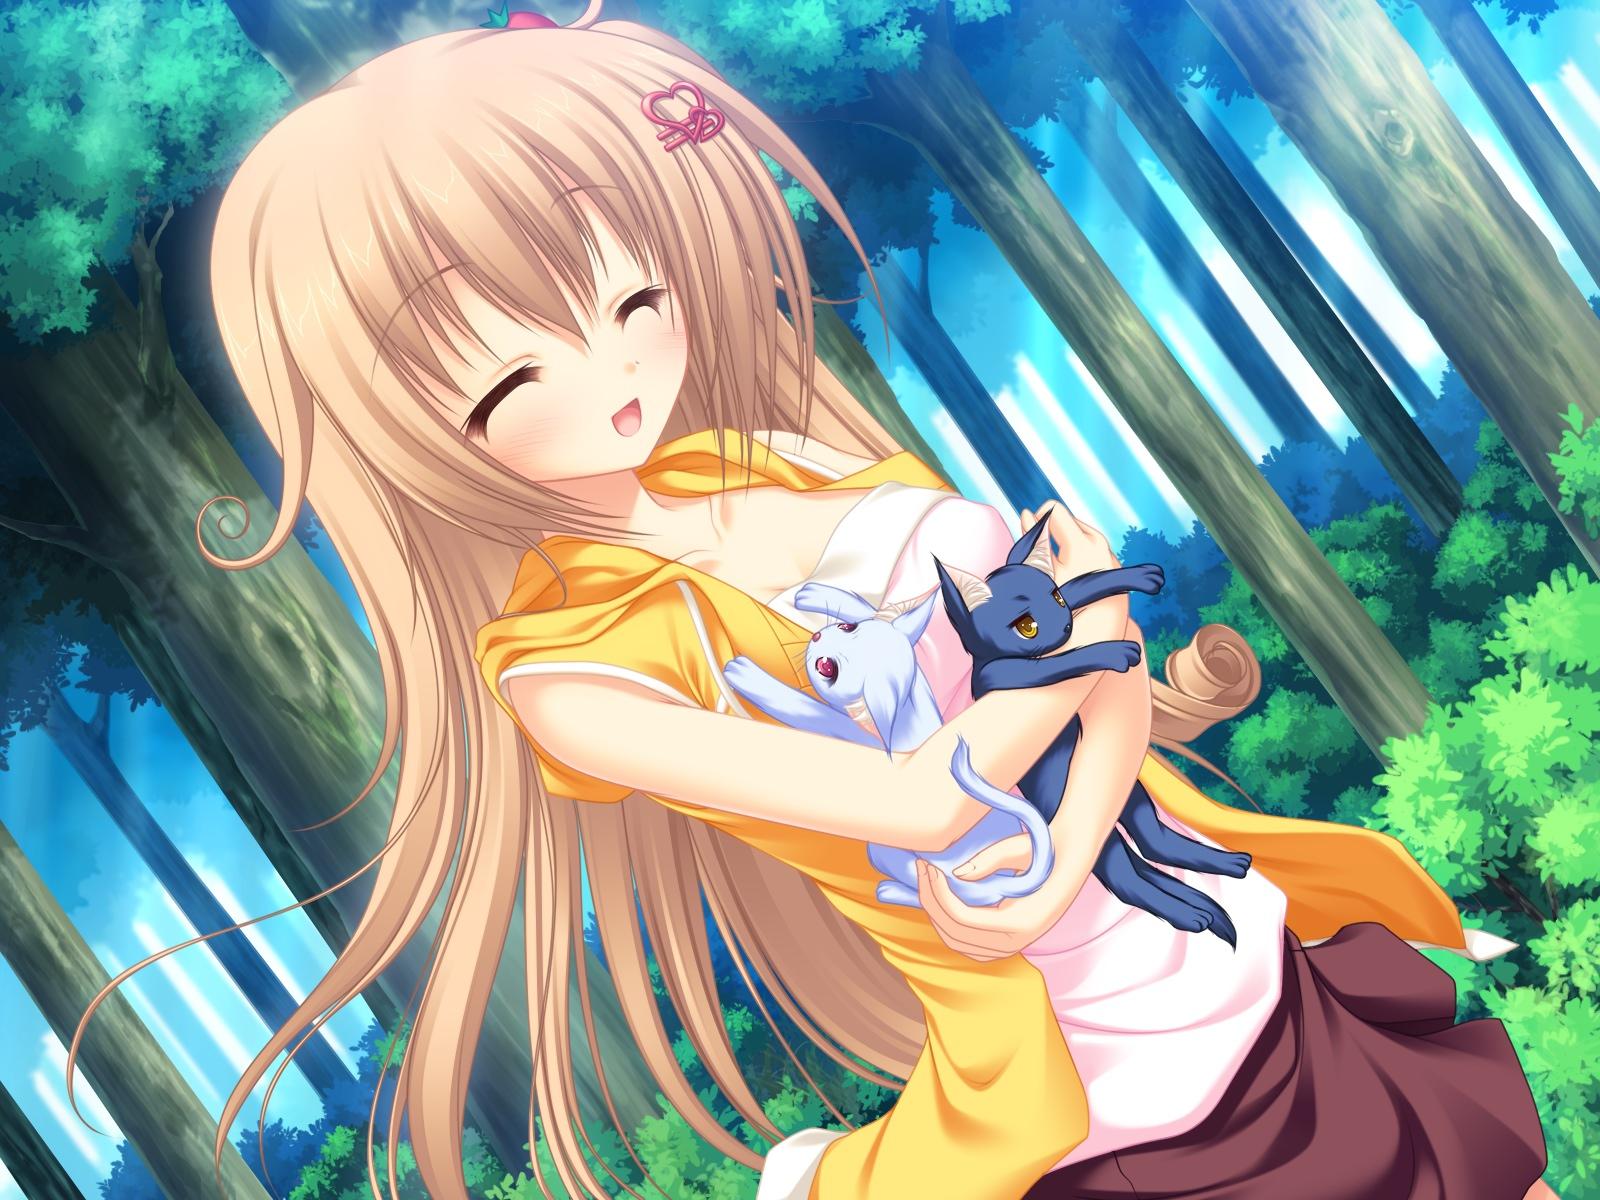 animal blush brown_hair cat long_hair mikagami_mamizu neko_koi ryuudou_misaki whirlpool